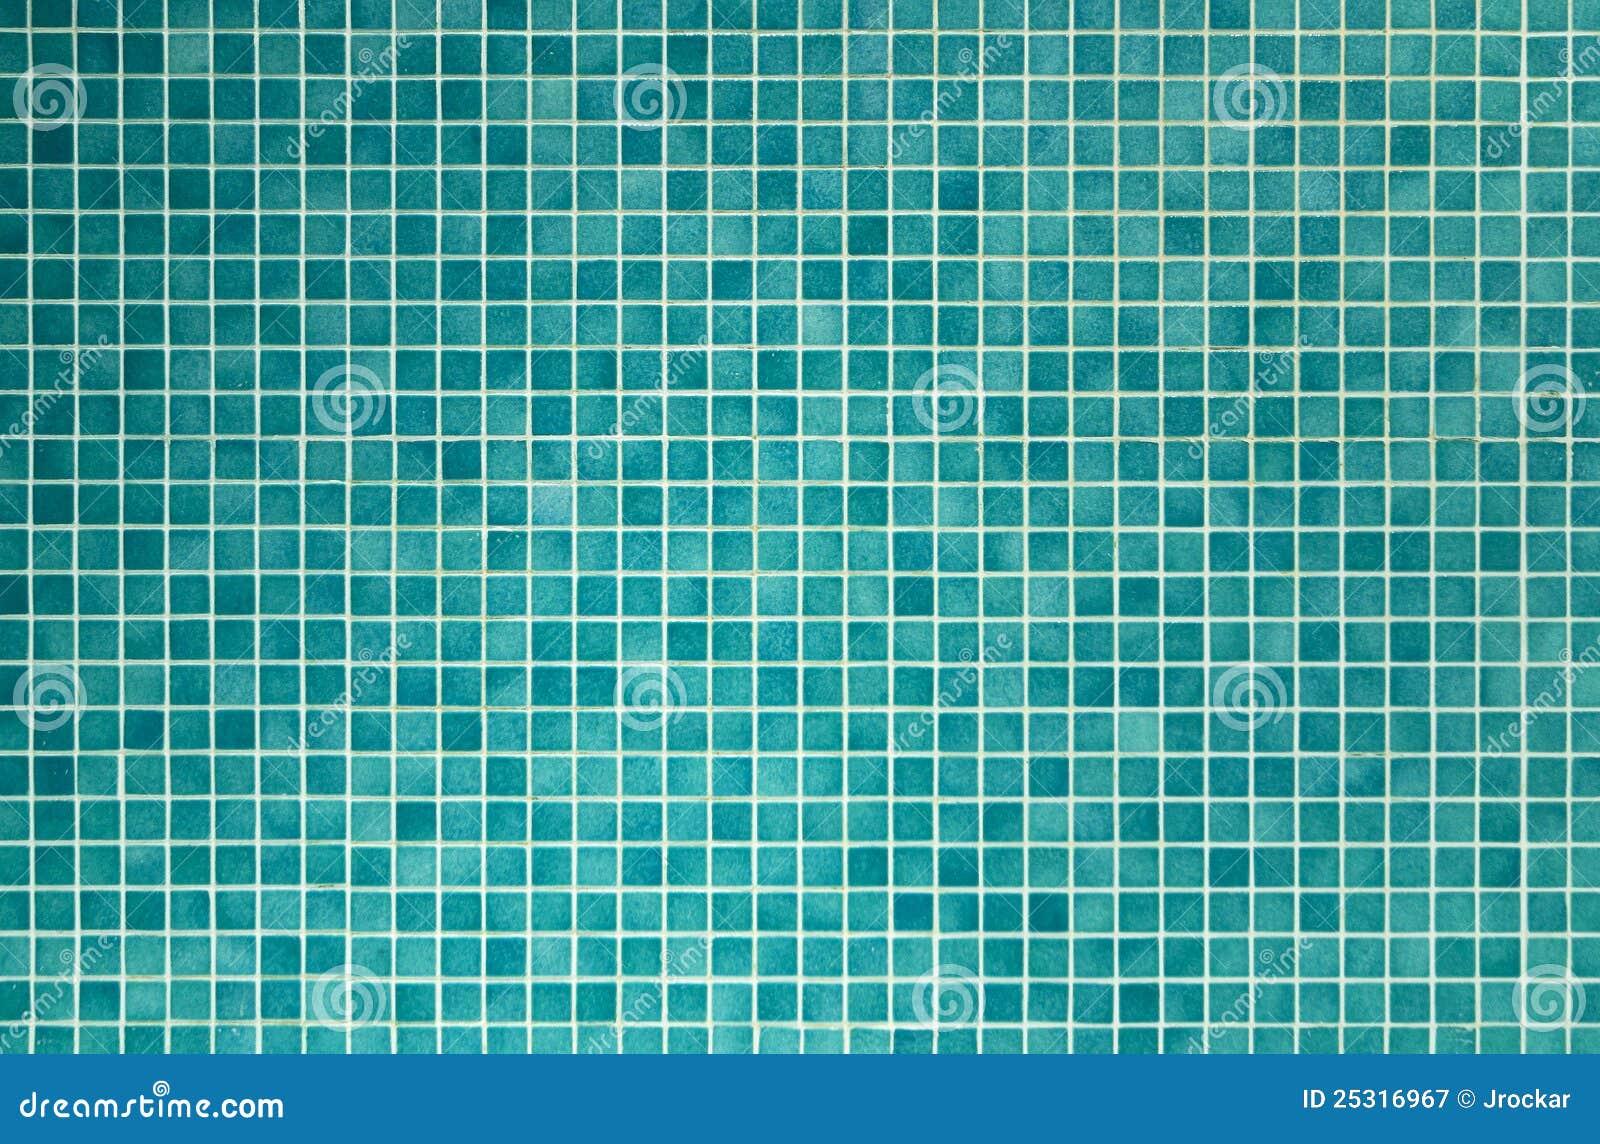 Azulejos Baño Verdes:Blue Green Mosaic Floor Tile for Bathroom